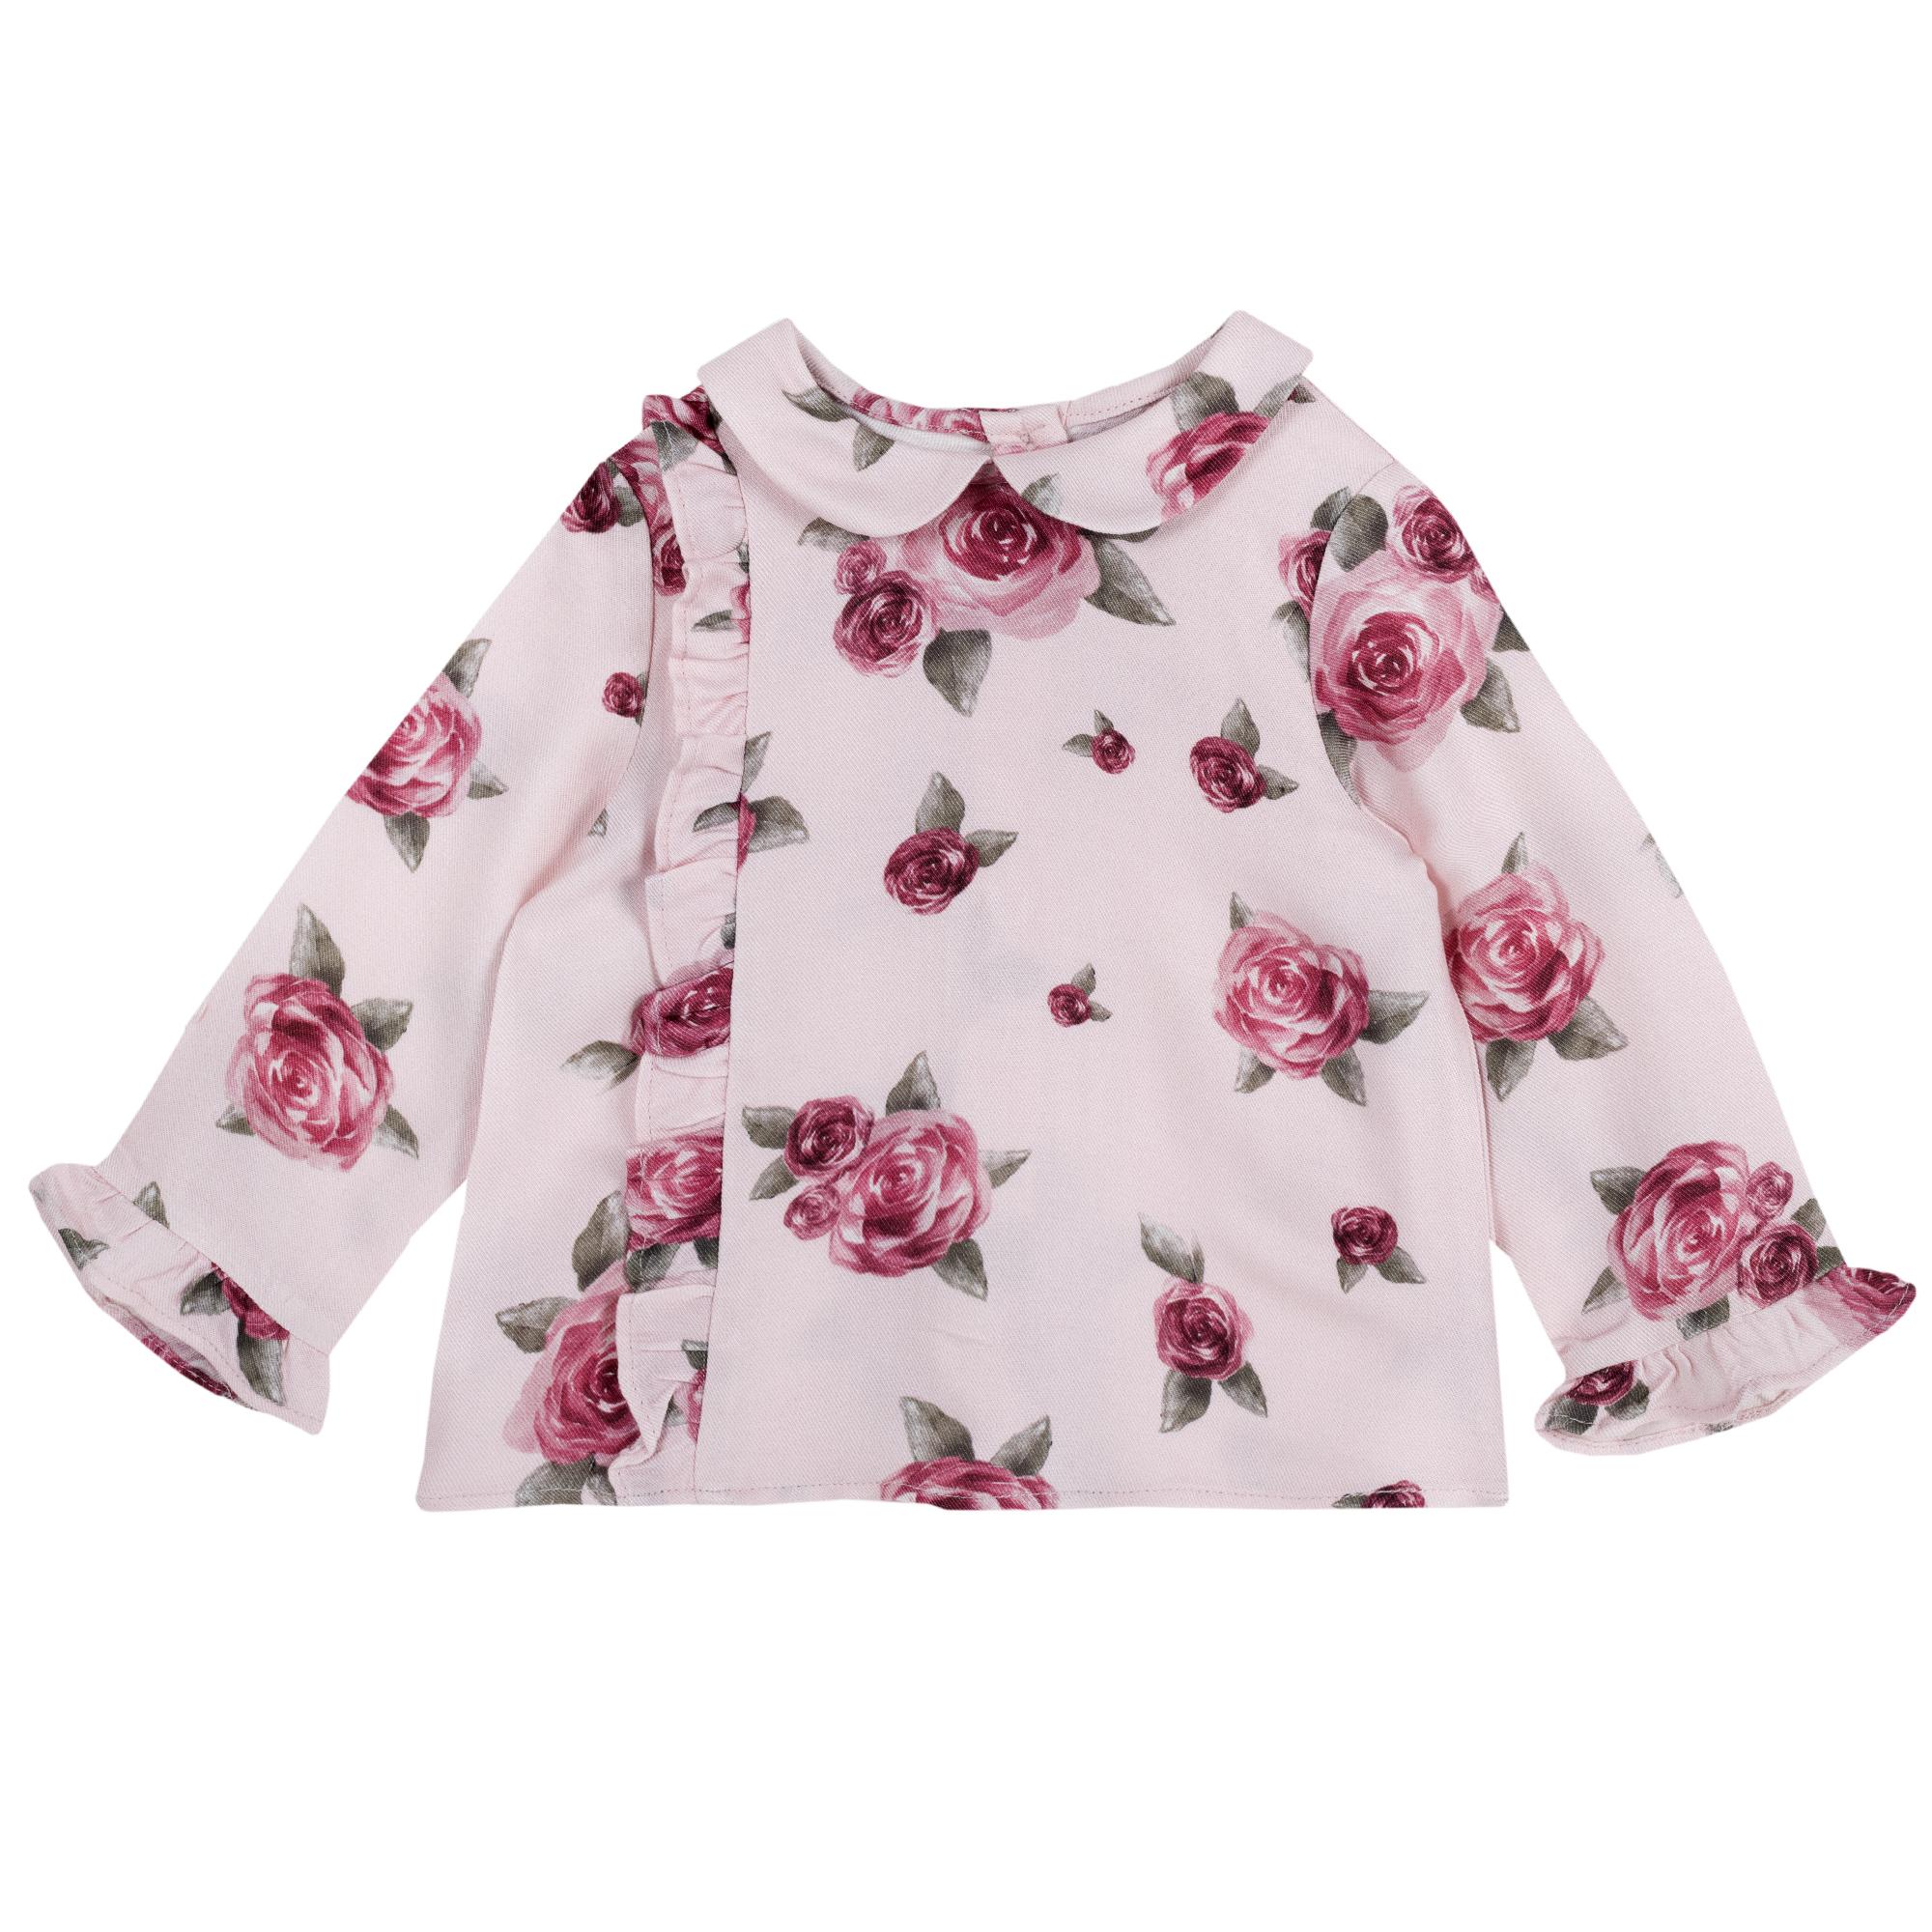 Camasa copii Chicco, roz cu trandafiri